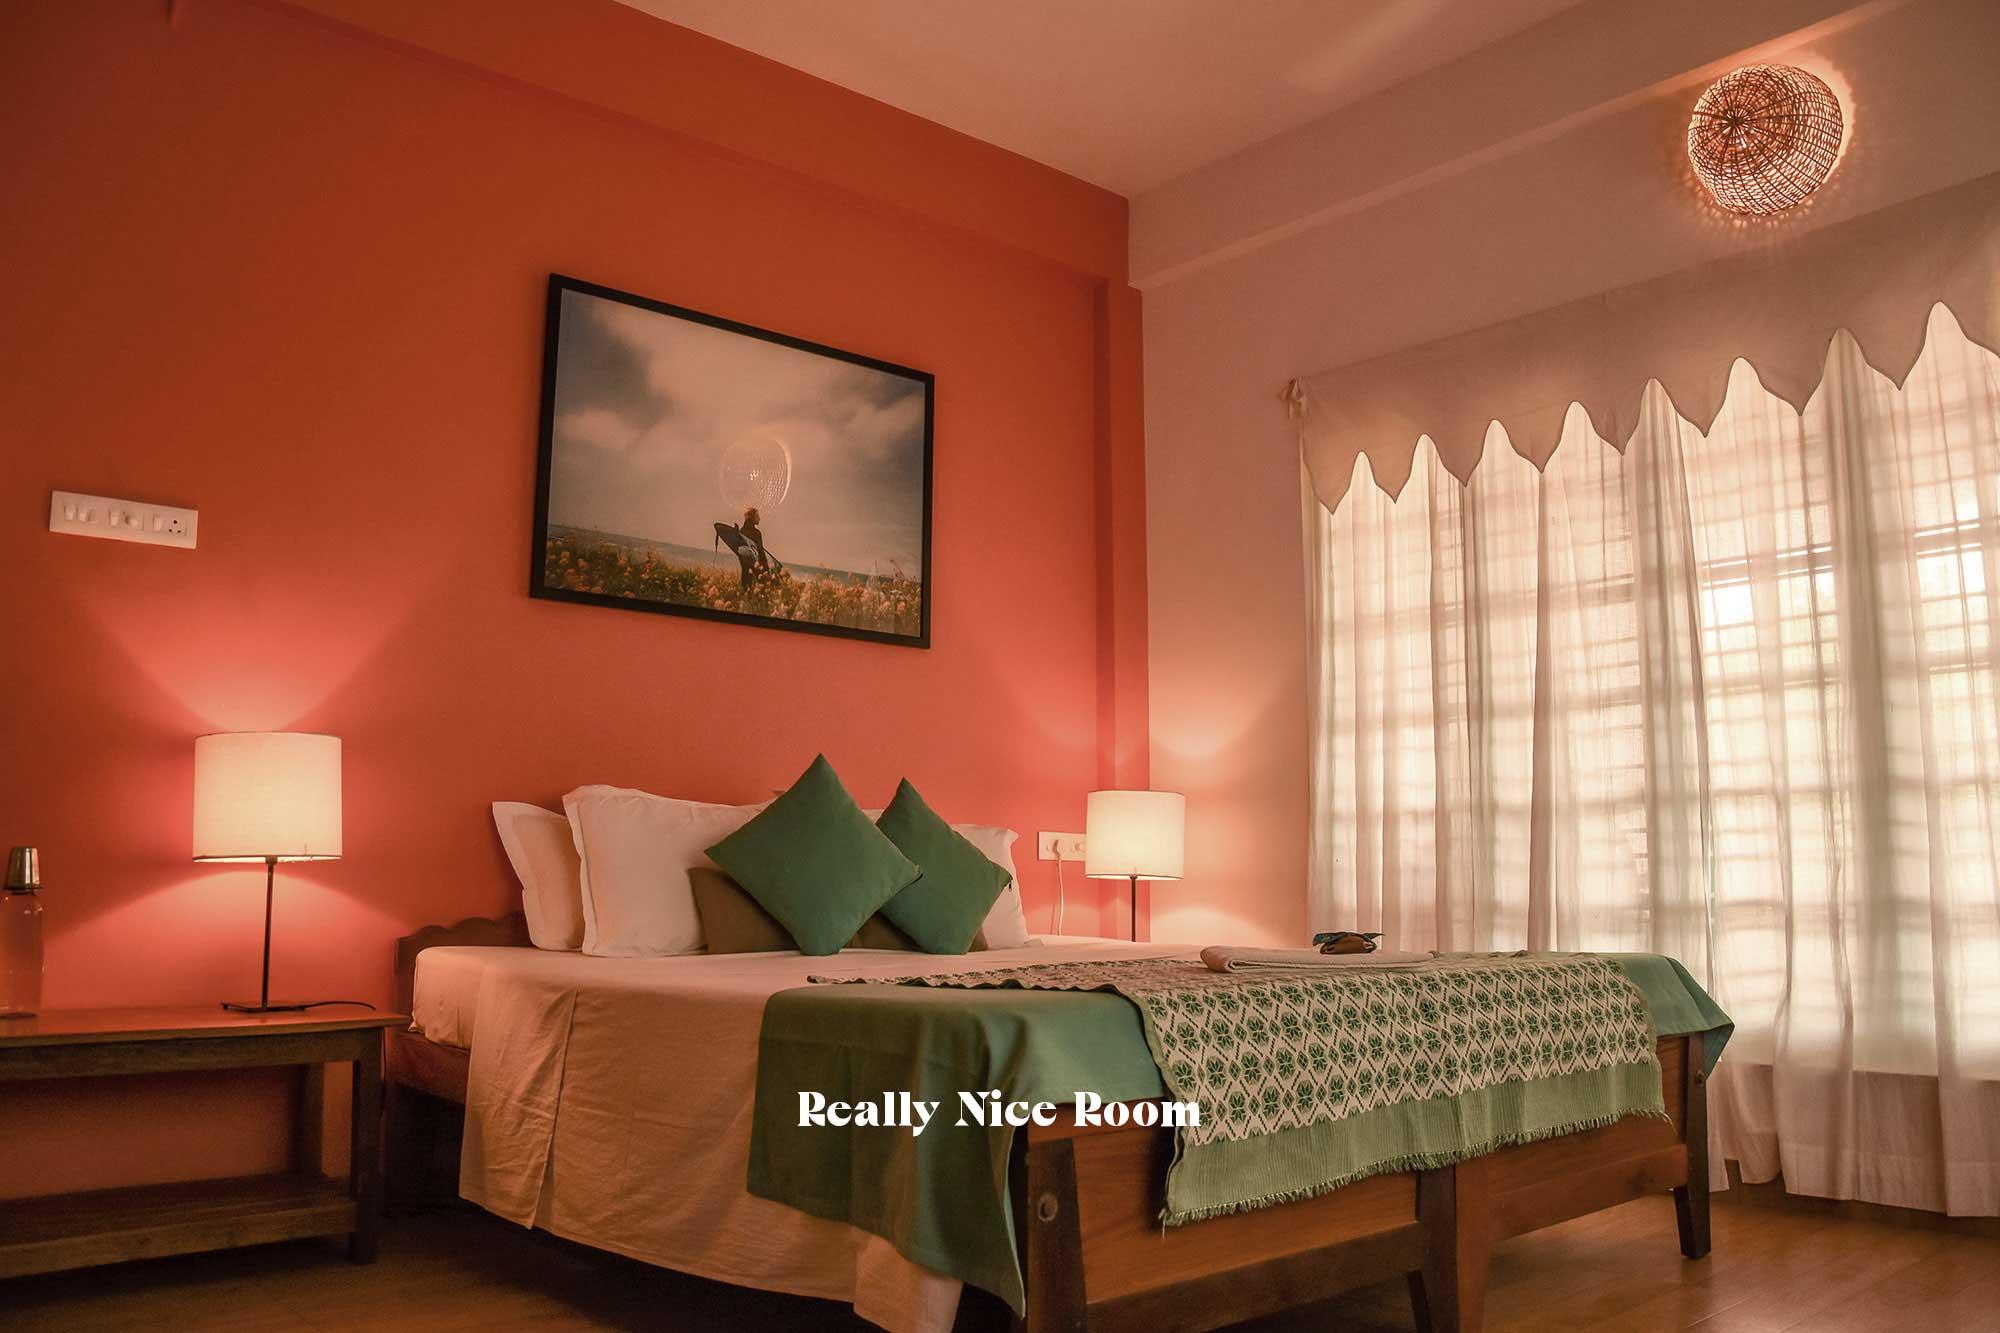 https://www.soulandsurf.com/wp-content/uploads/2021/10/roomsindia-images-@peterchamberlainphoto-_-@tarashirls_Rooms_2.jpg